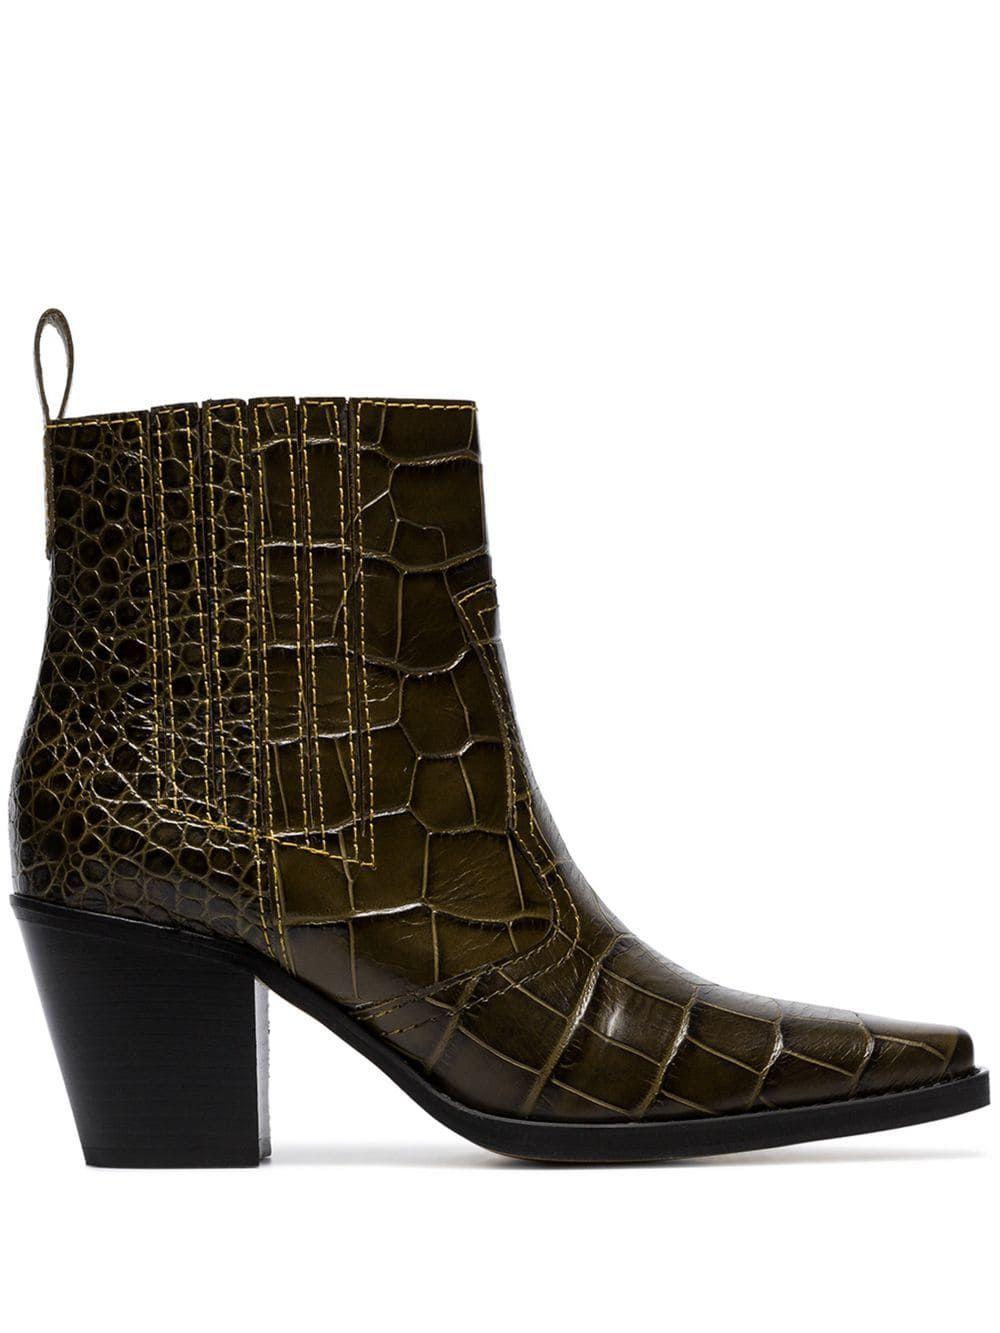 8584e1c19f7d5 Ganni brown Callie 70 crocodile-effect leather ankle boots Ganni Brown  Callie 70 crocodile-